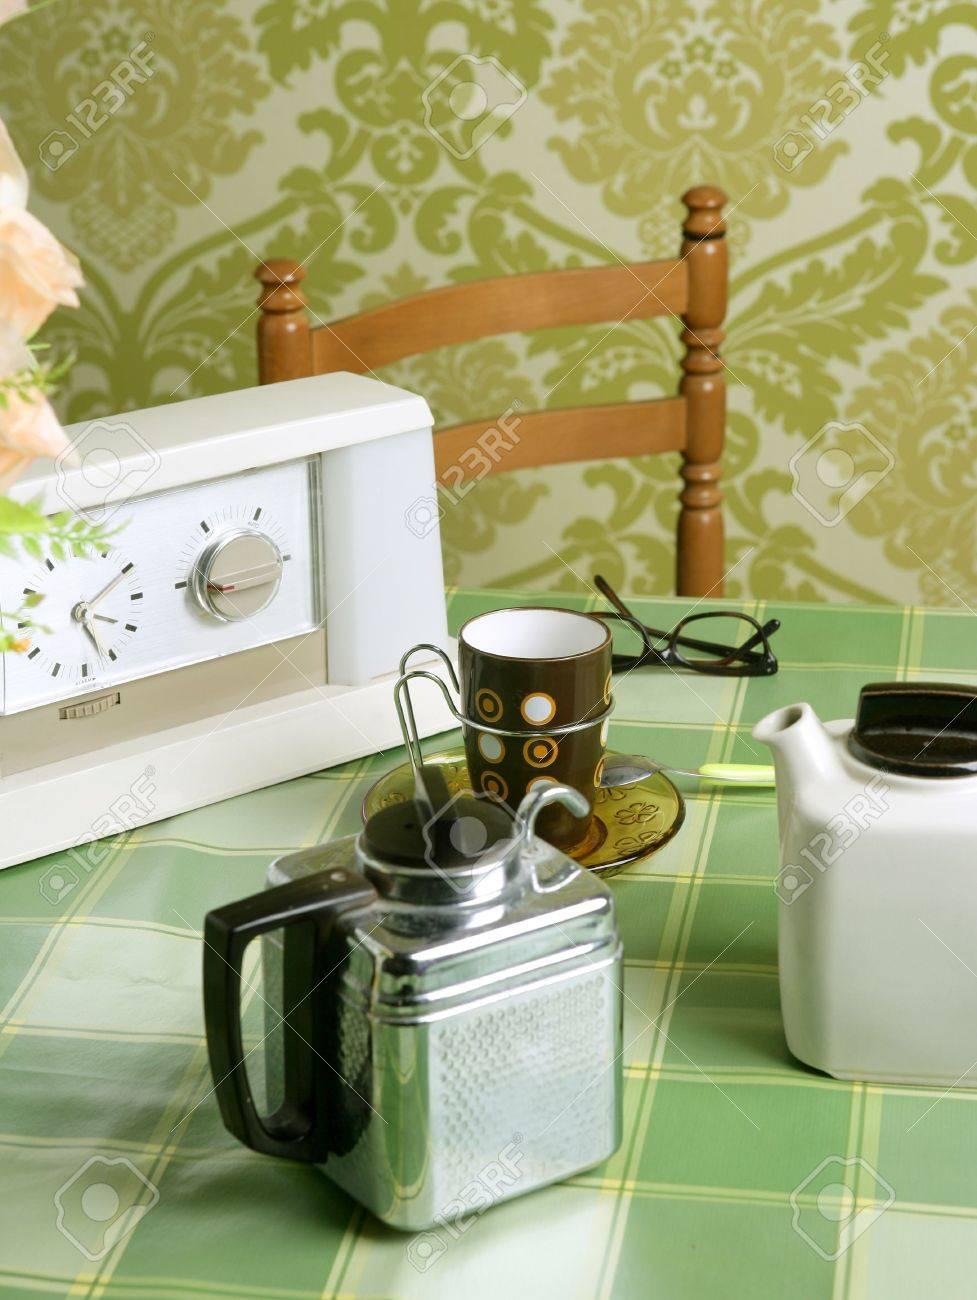 Cosecha De Papel Tapiz Verde De Mantel De Cafe Maquina Cocina